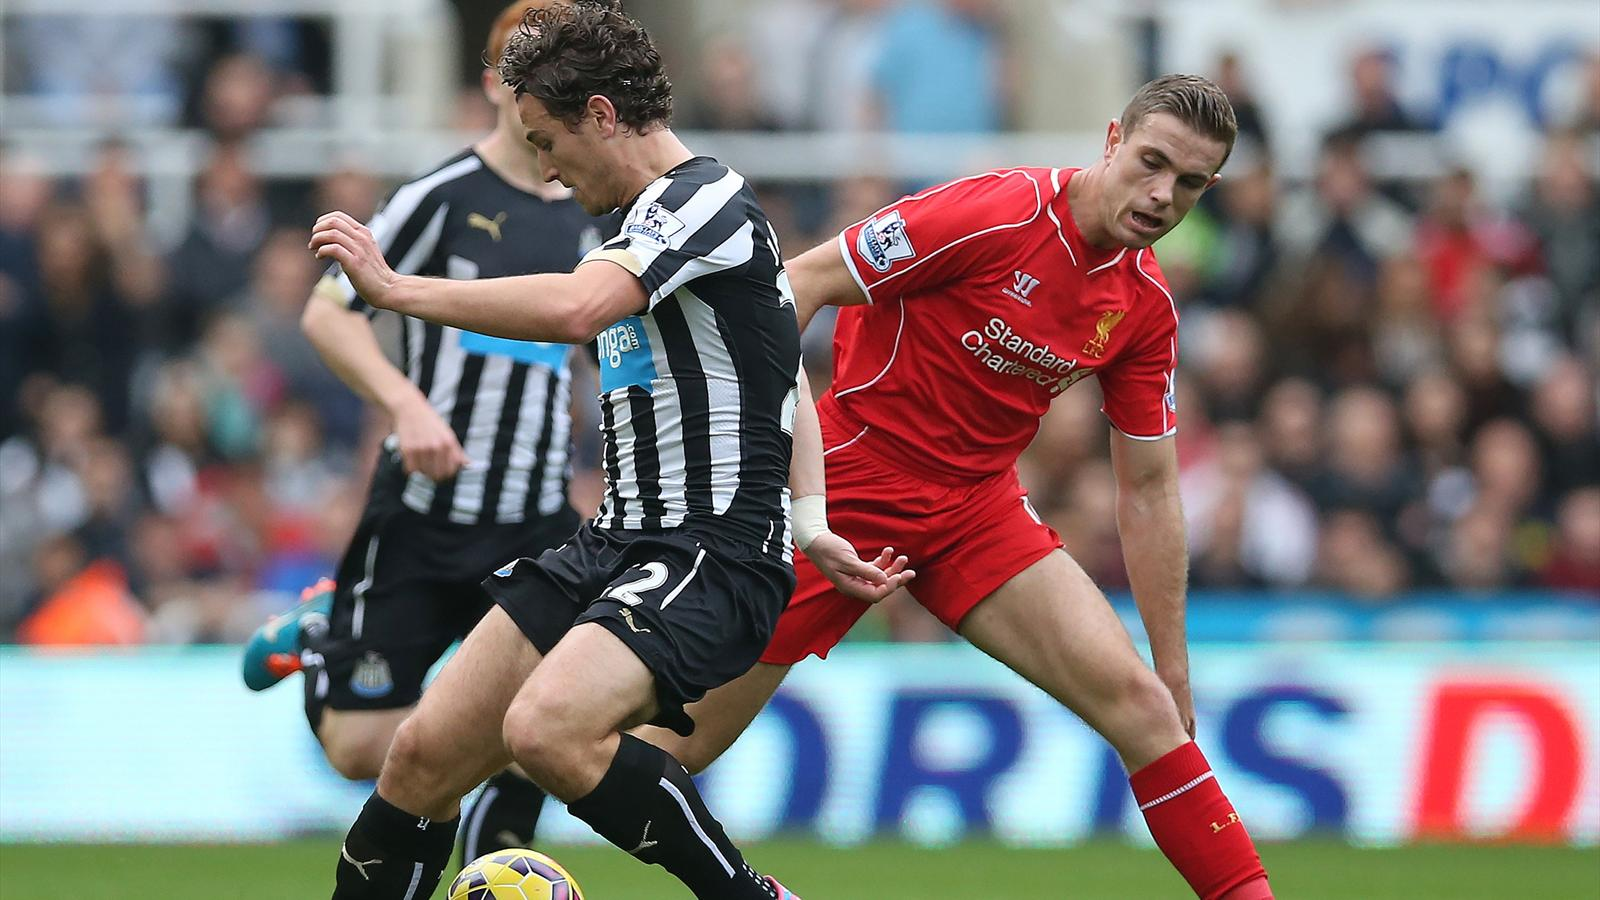 Newcastle 1-0 Liverpool : Liverpool chute à Newcastle